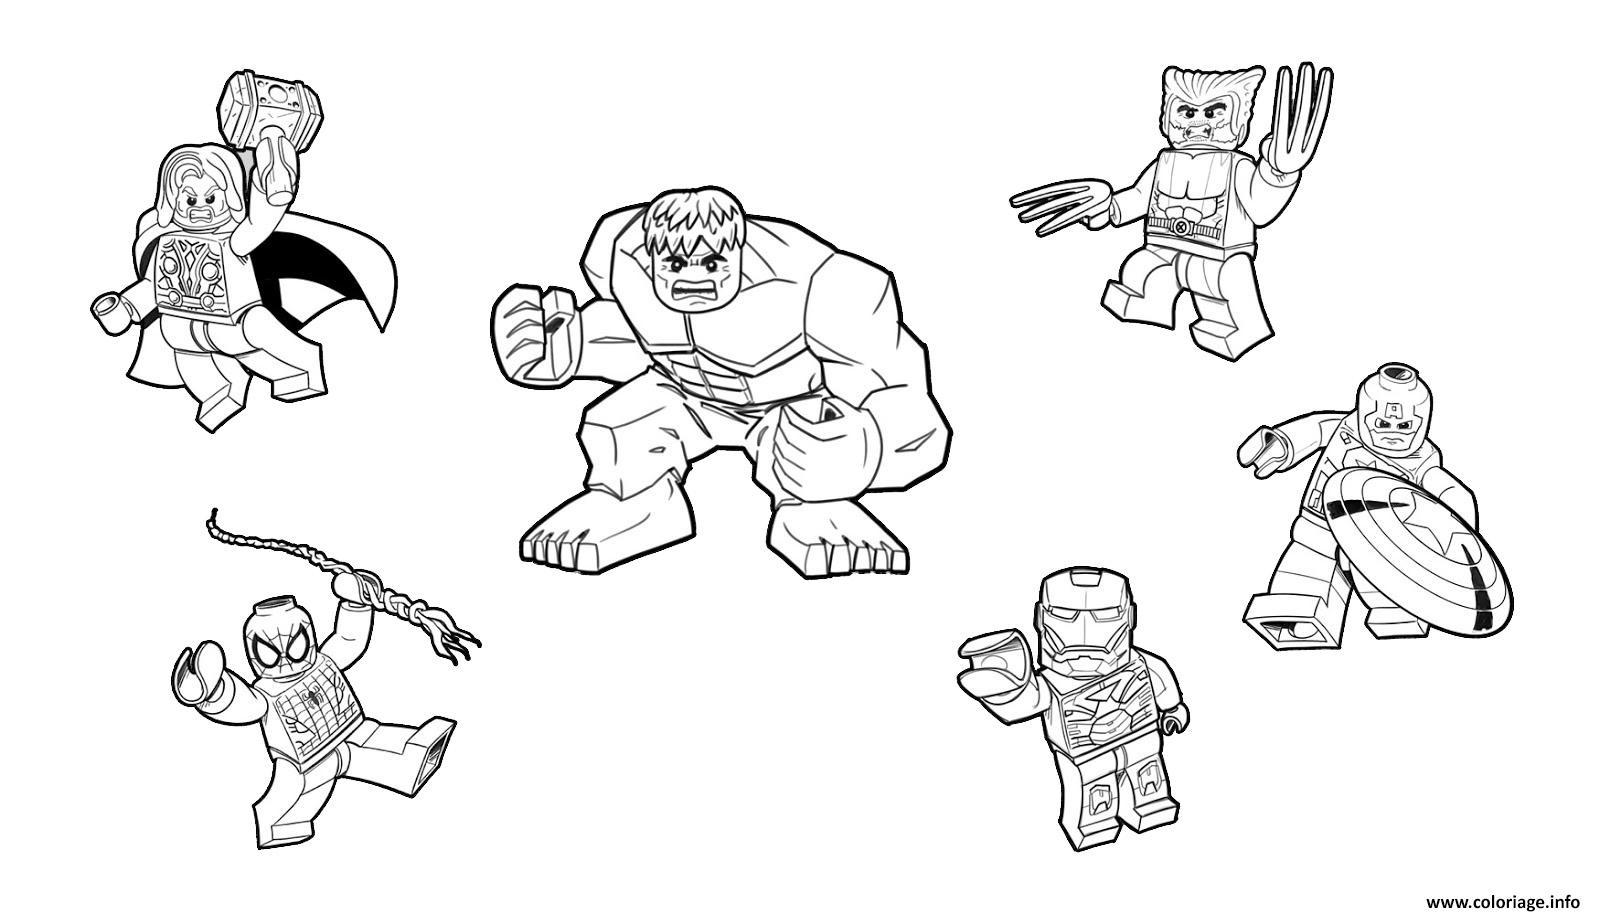 Coloriage team lego marvel hulk ironman spiderman thor - Coloriage lego spiderman ...